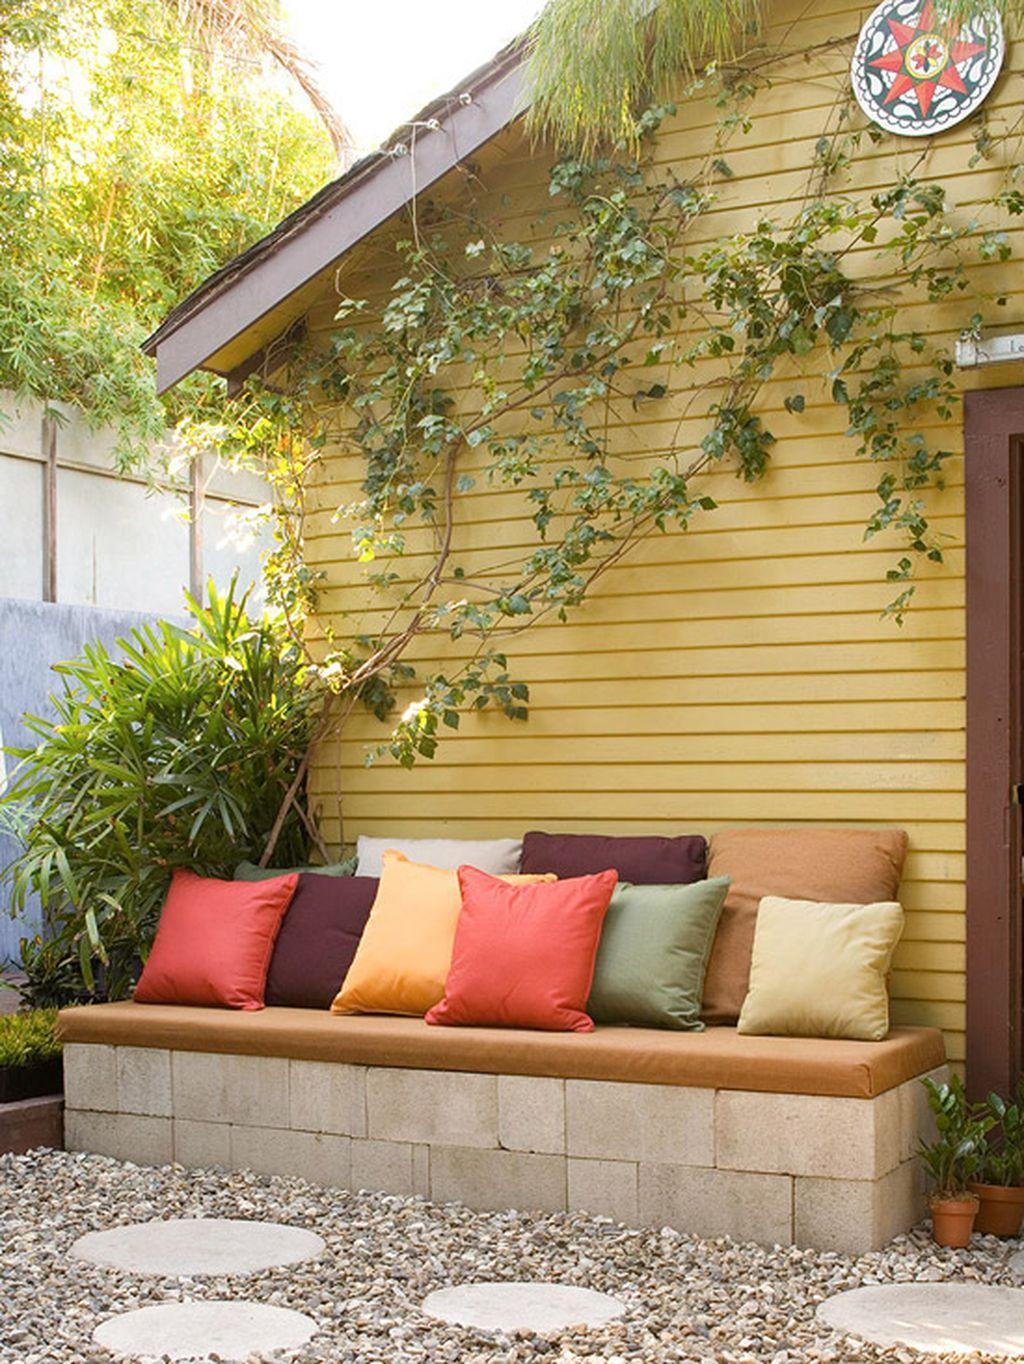 63 Creative Cinder Block Backyard Ideas on a Budget | Backyard ...